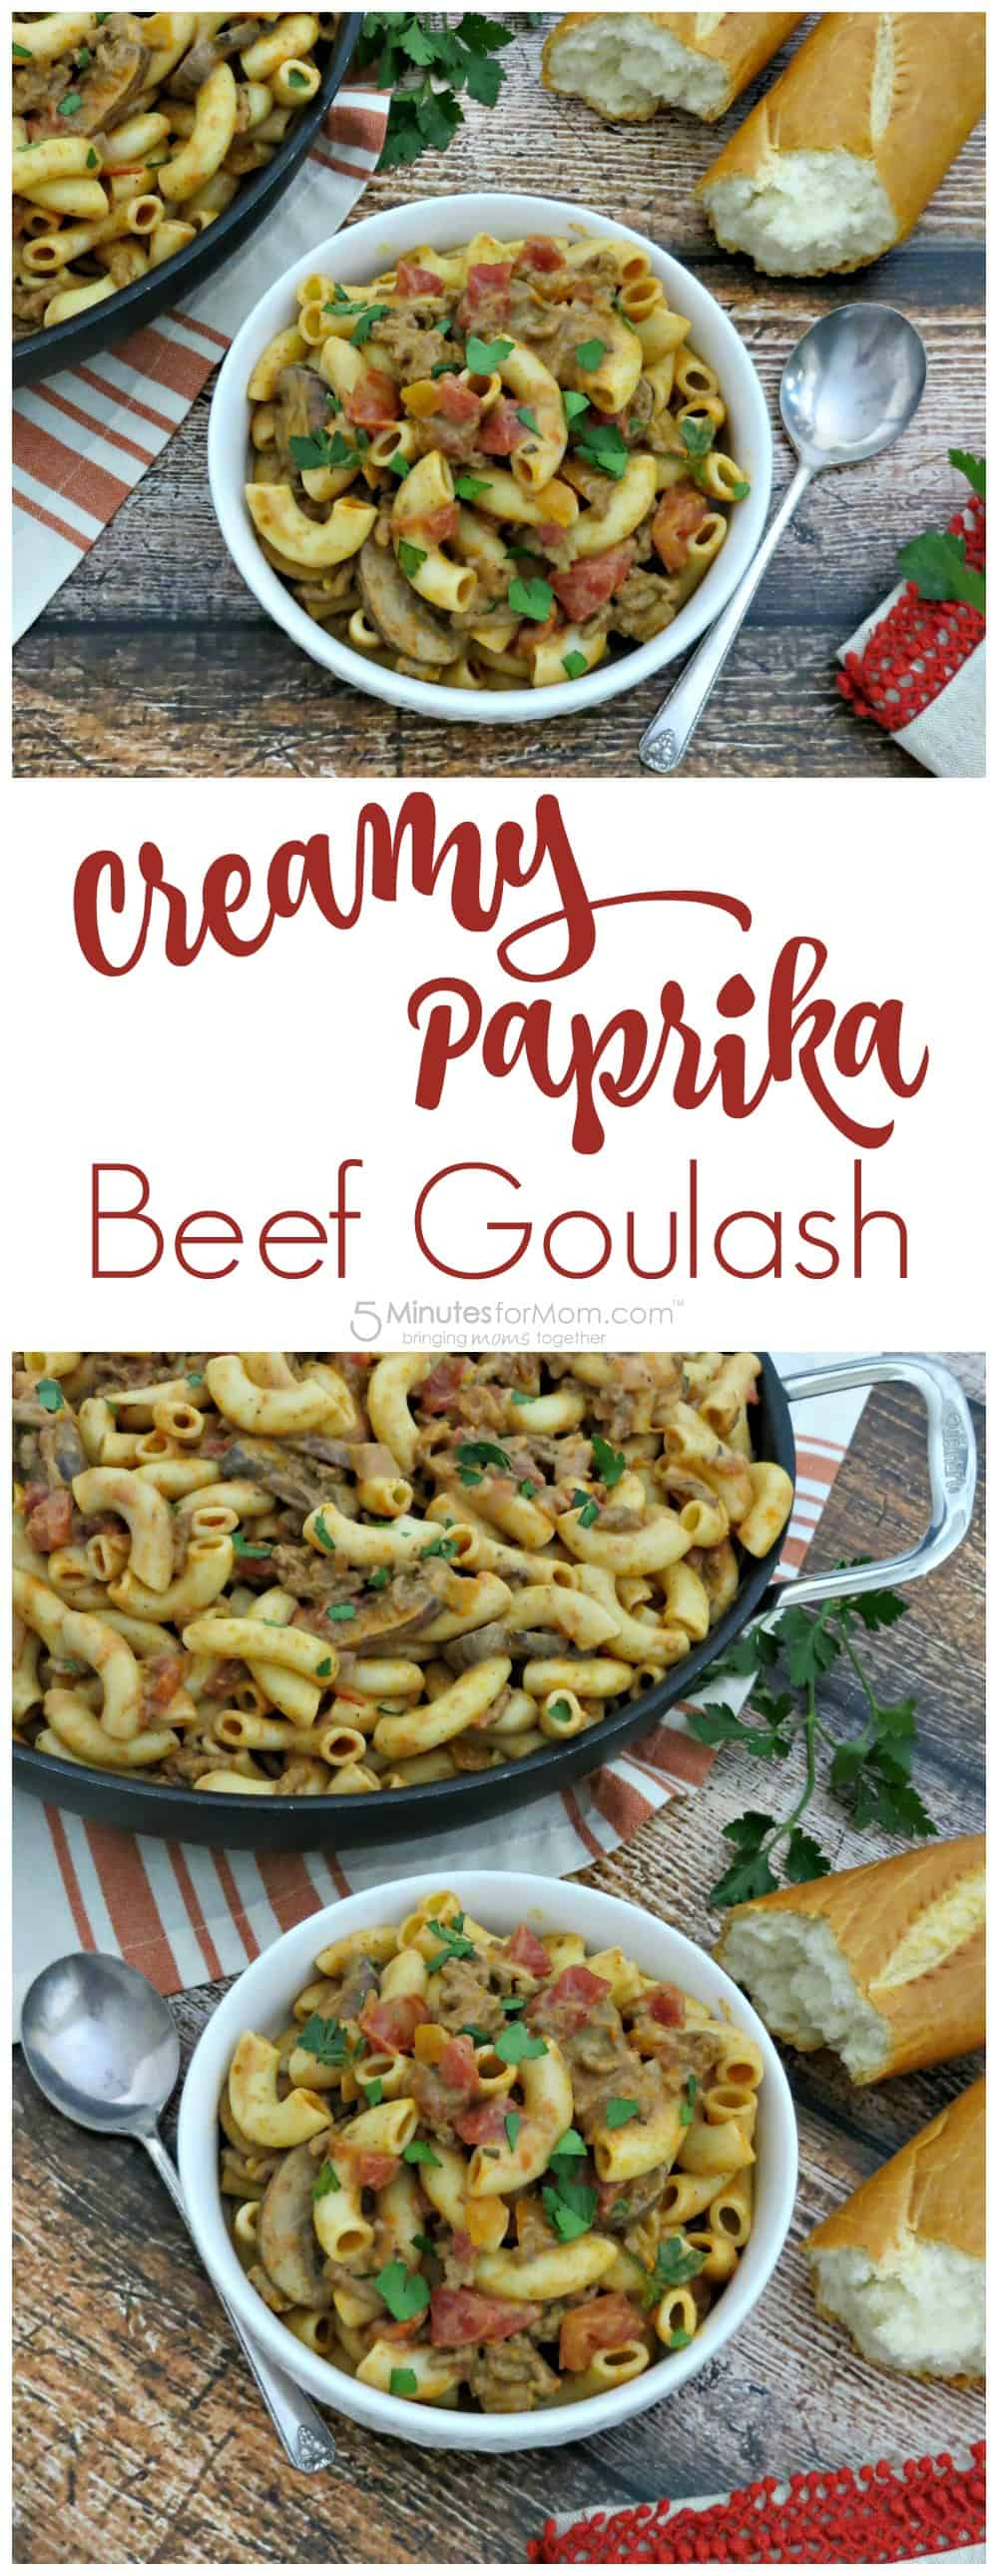 Creamy Paprika Beef Goulash Recipe